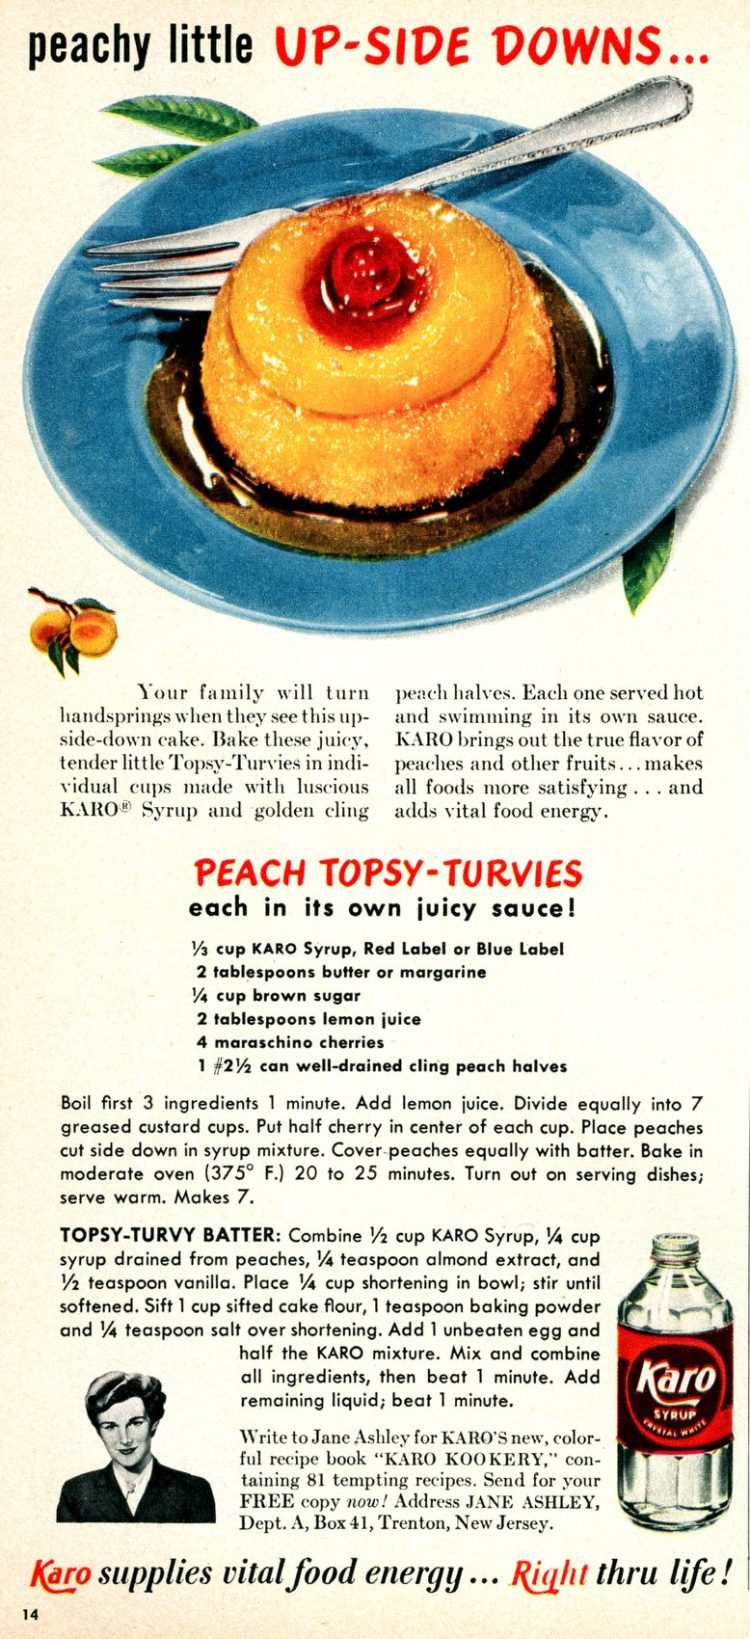 Peach topsy-turvies eretro recipe